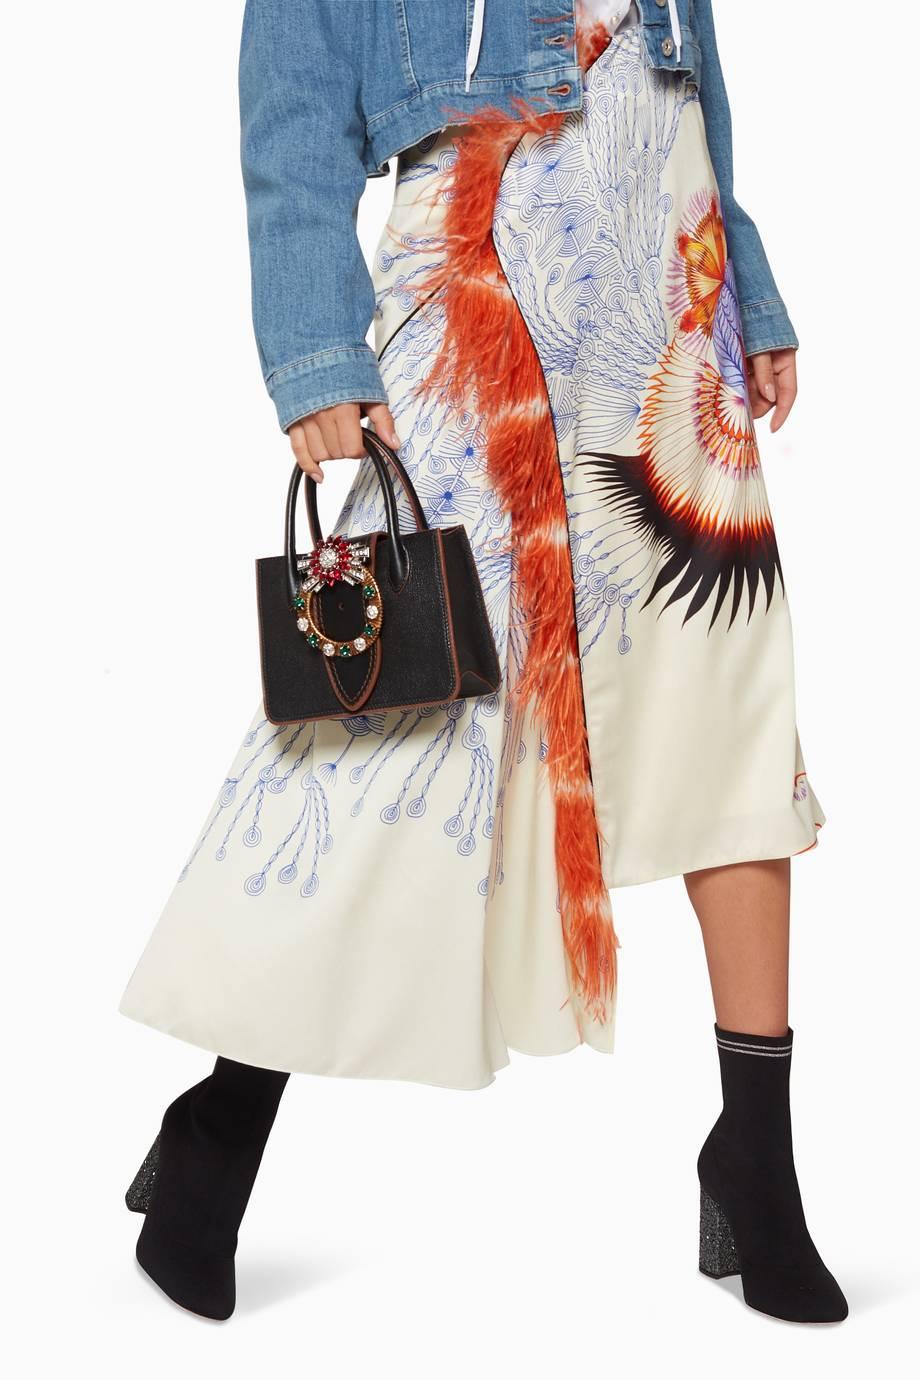 37399046bf Shop Luxury Miu Miu Black Nano Lady Madras Embellished Top Handle ...